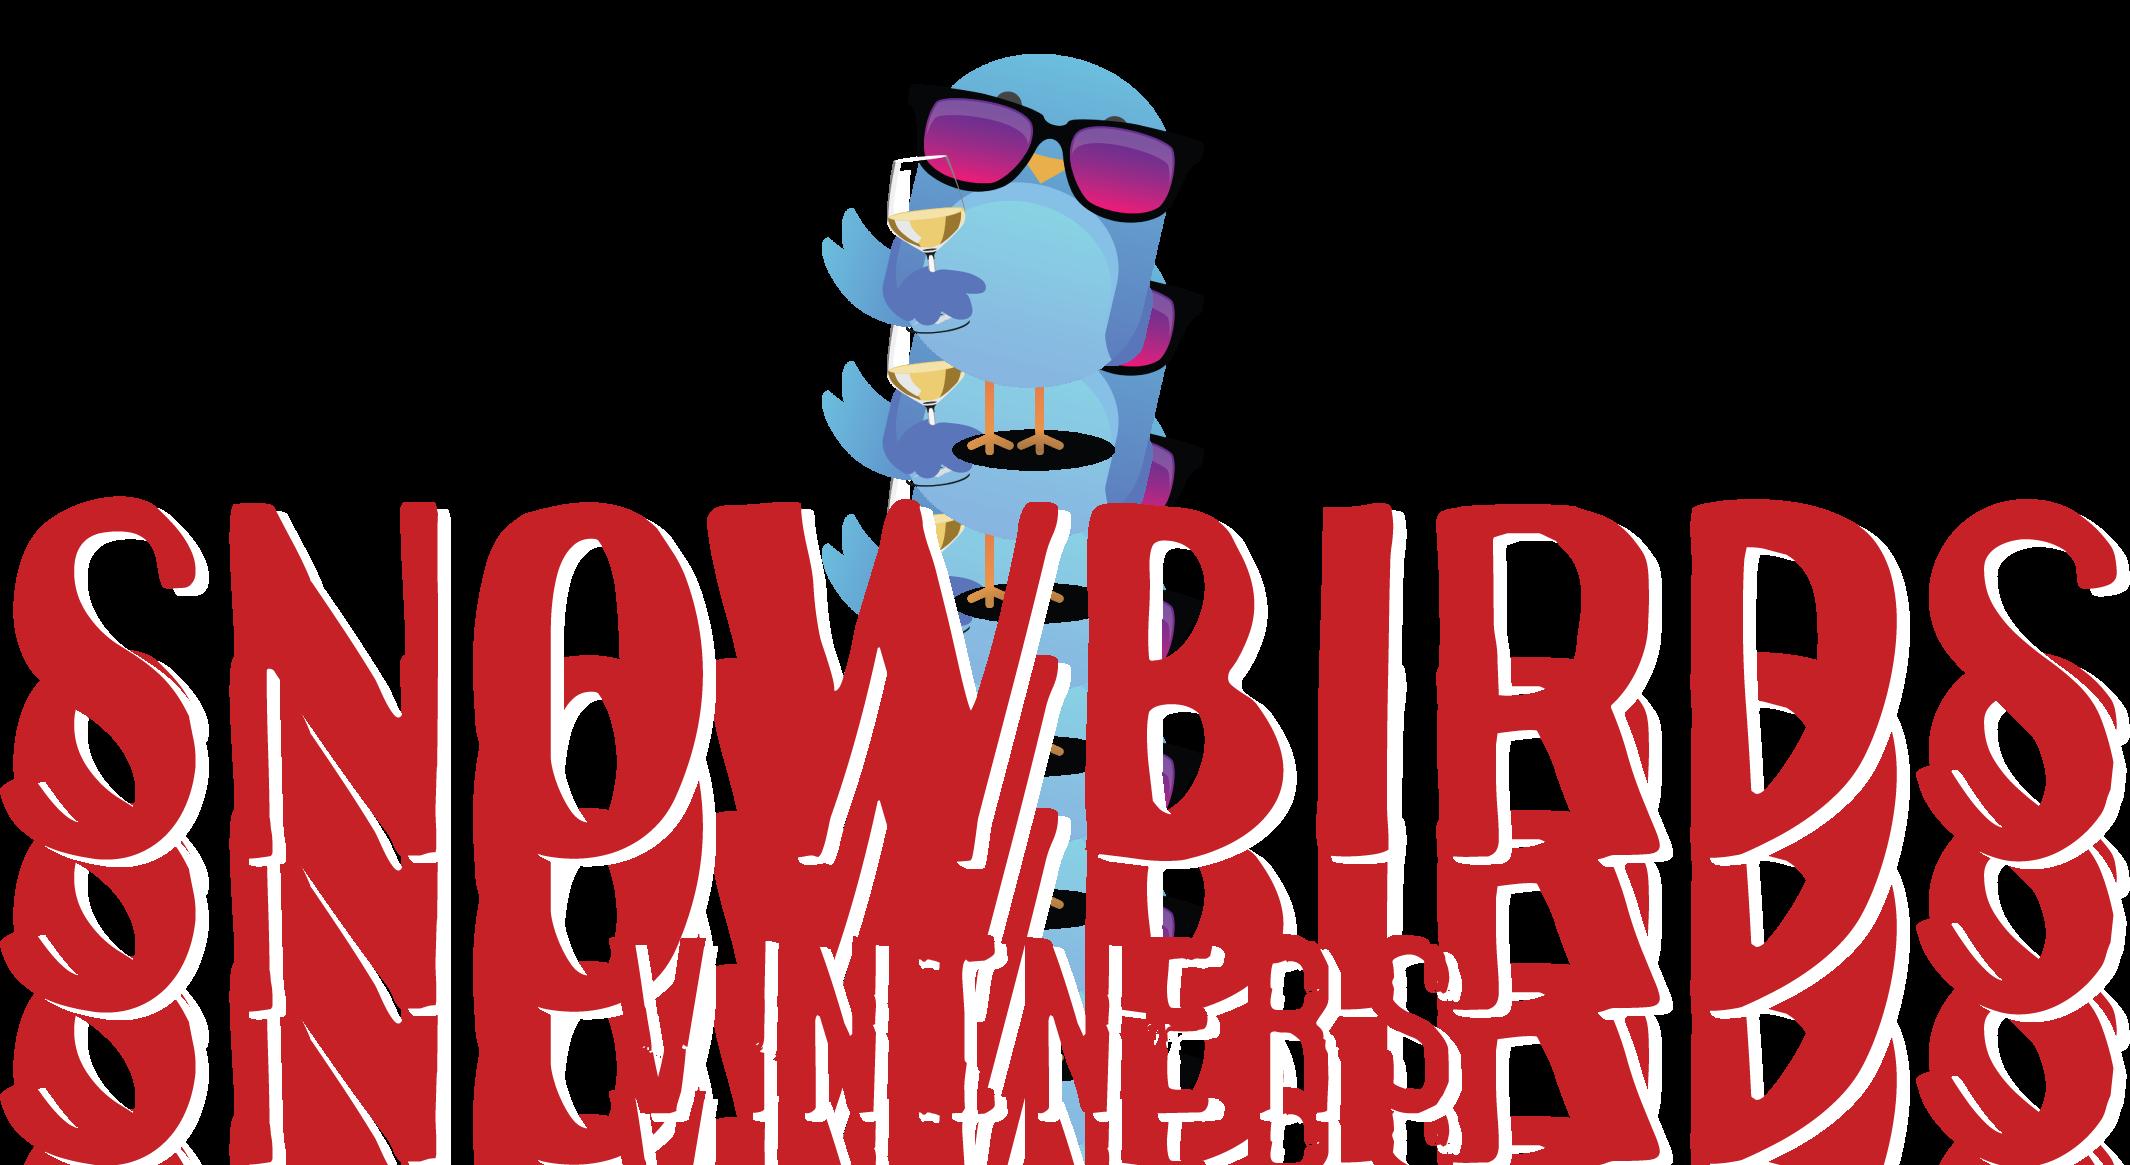 Snowbirds Vintners